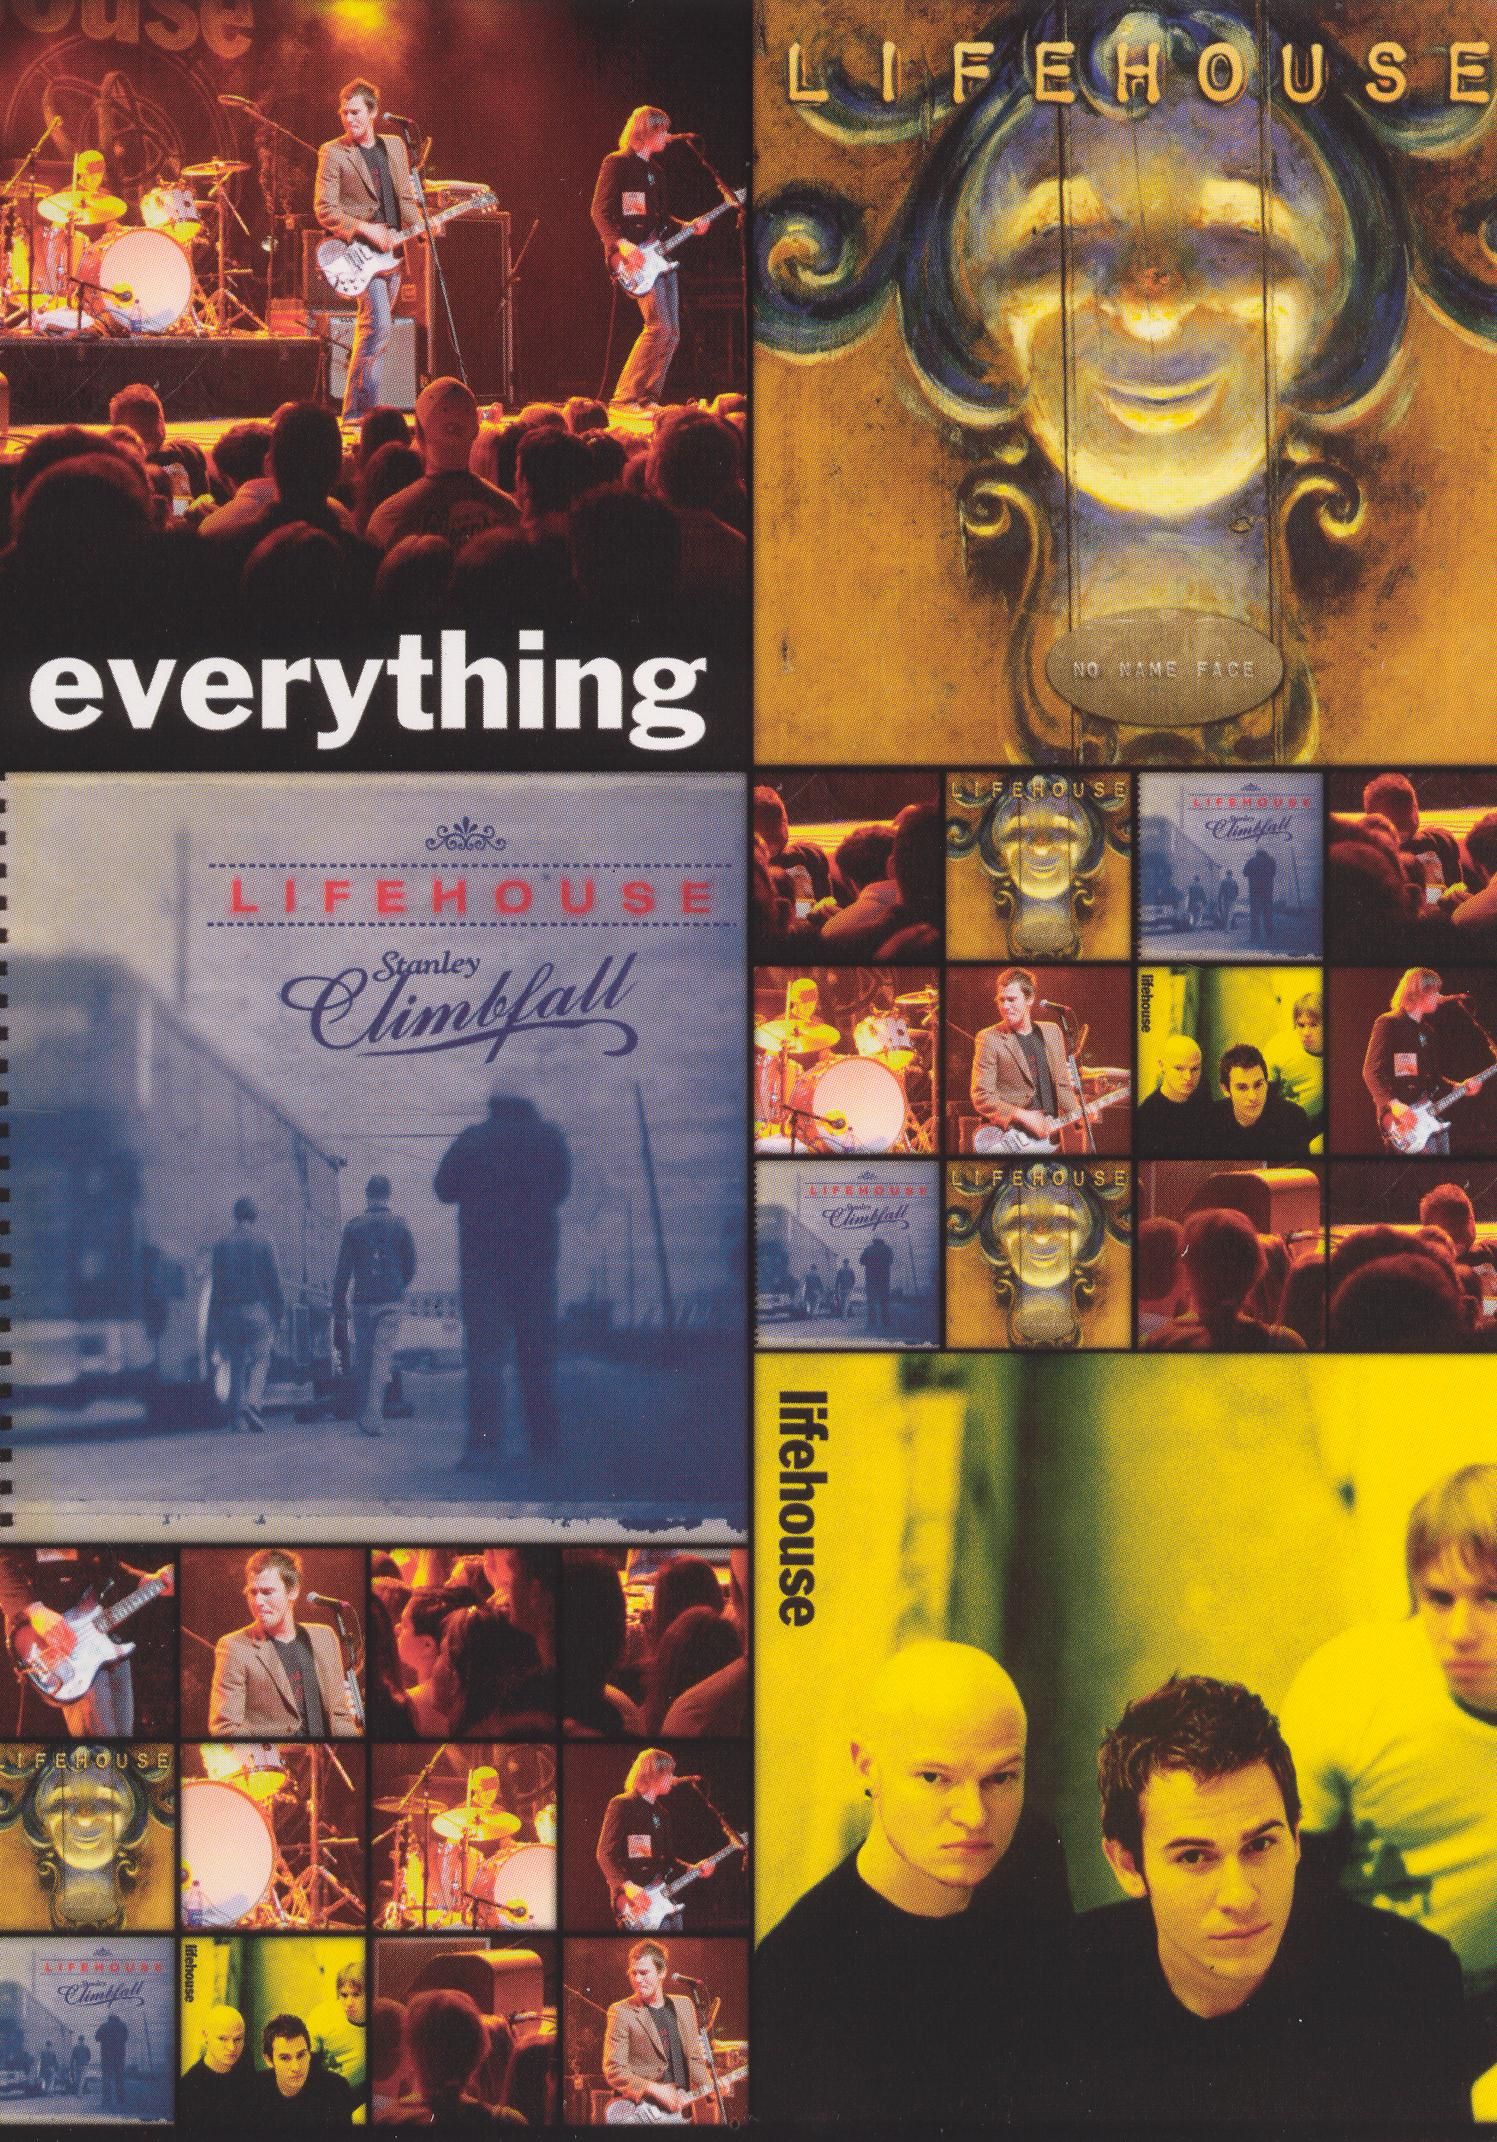 Lifehouse: Everything